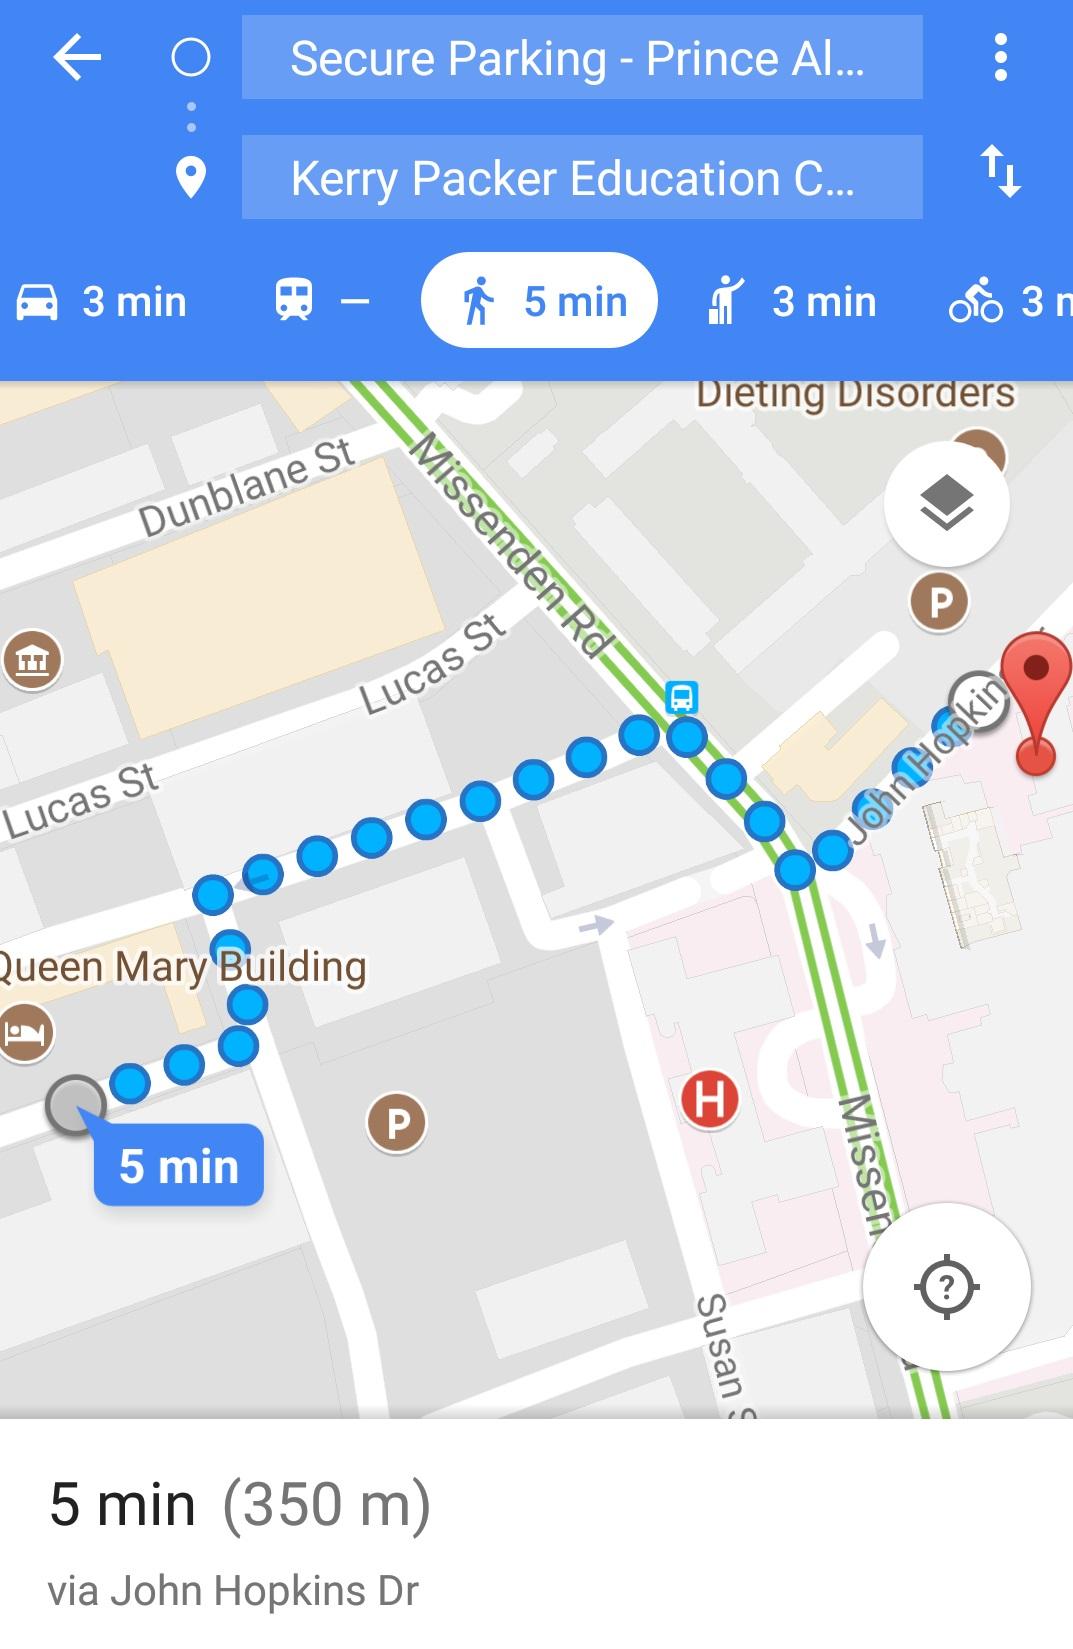 Parking walk to KPEC